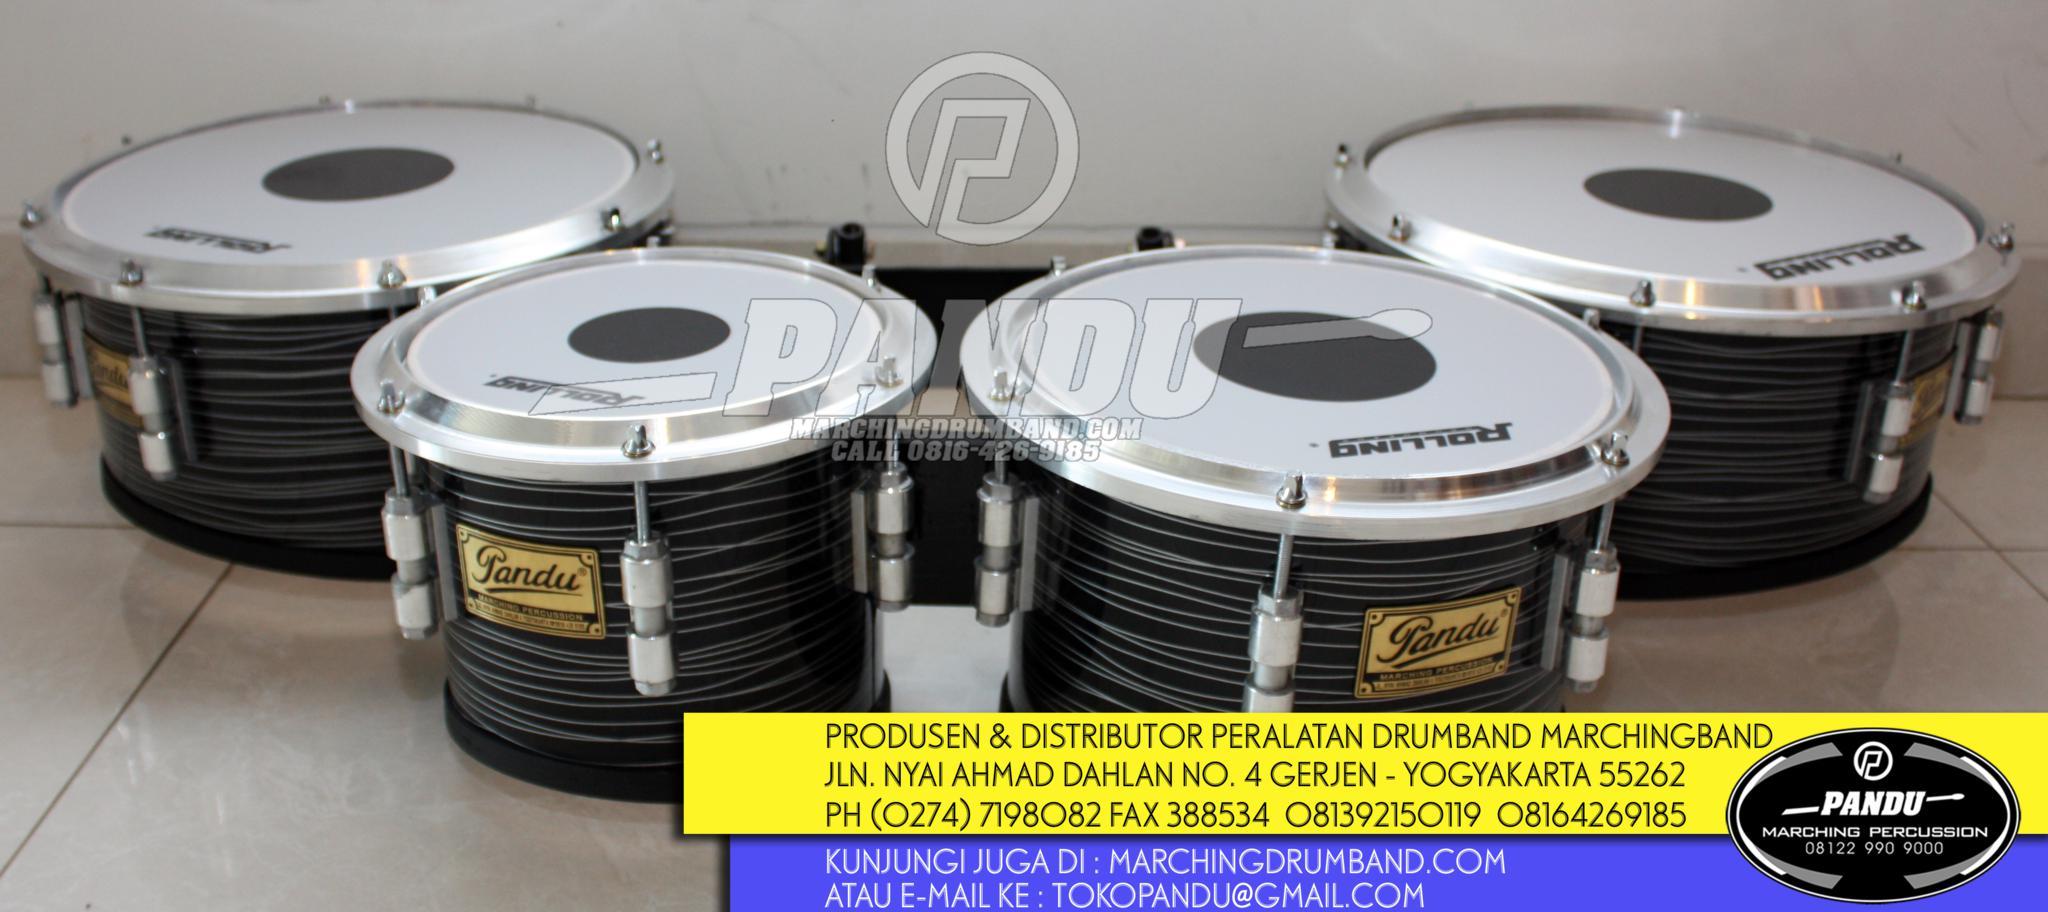 marchingband-semi-hts-quardtom-smp-sma-model-yamaha_2048x912